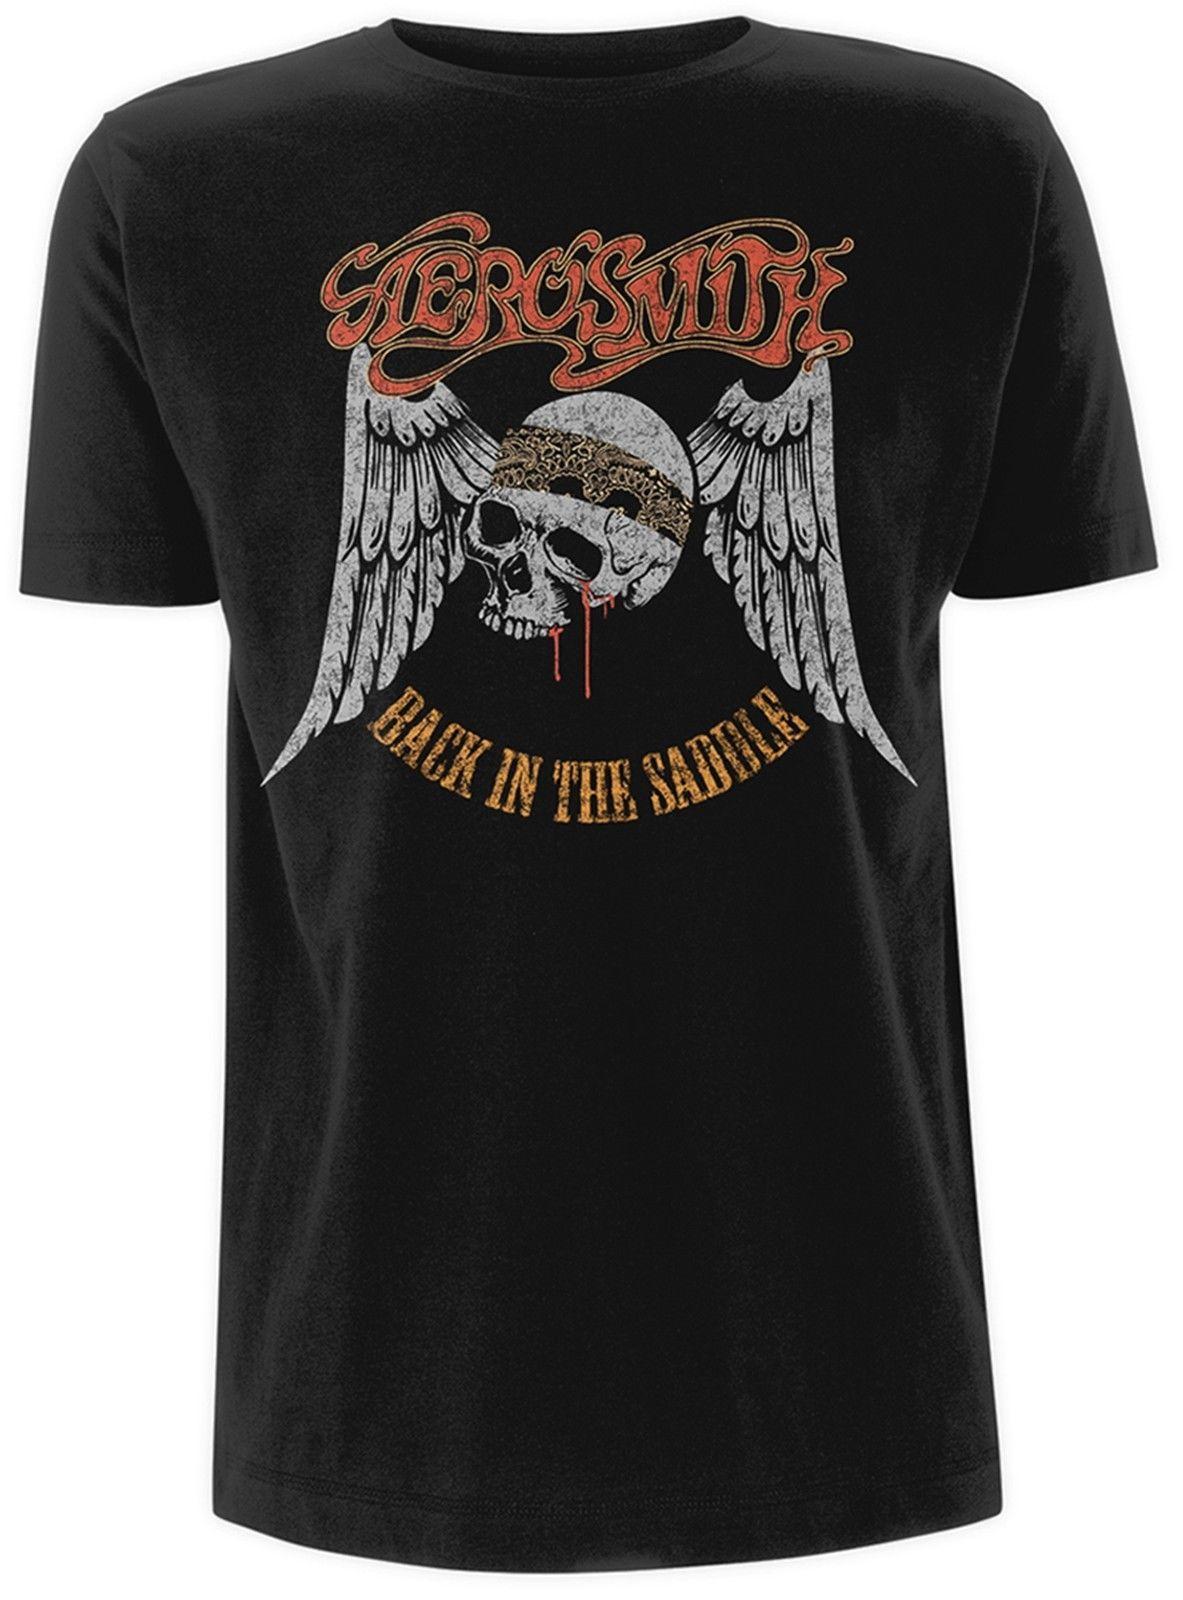 Aerosmith T Shirt Mens Cotton T Shirt Fashion Sports Tops Round Neck Short Sleeve Tee